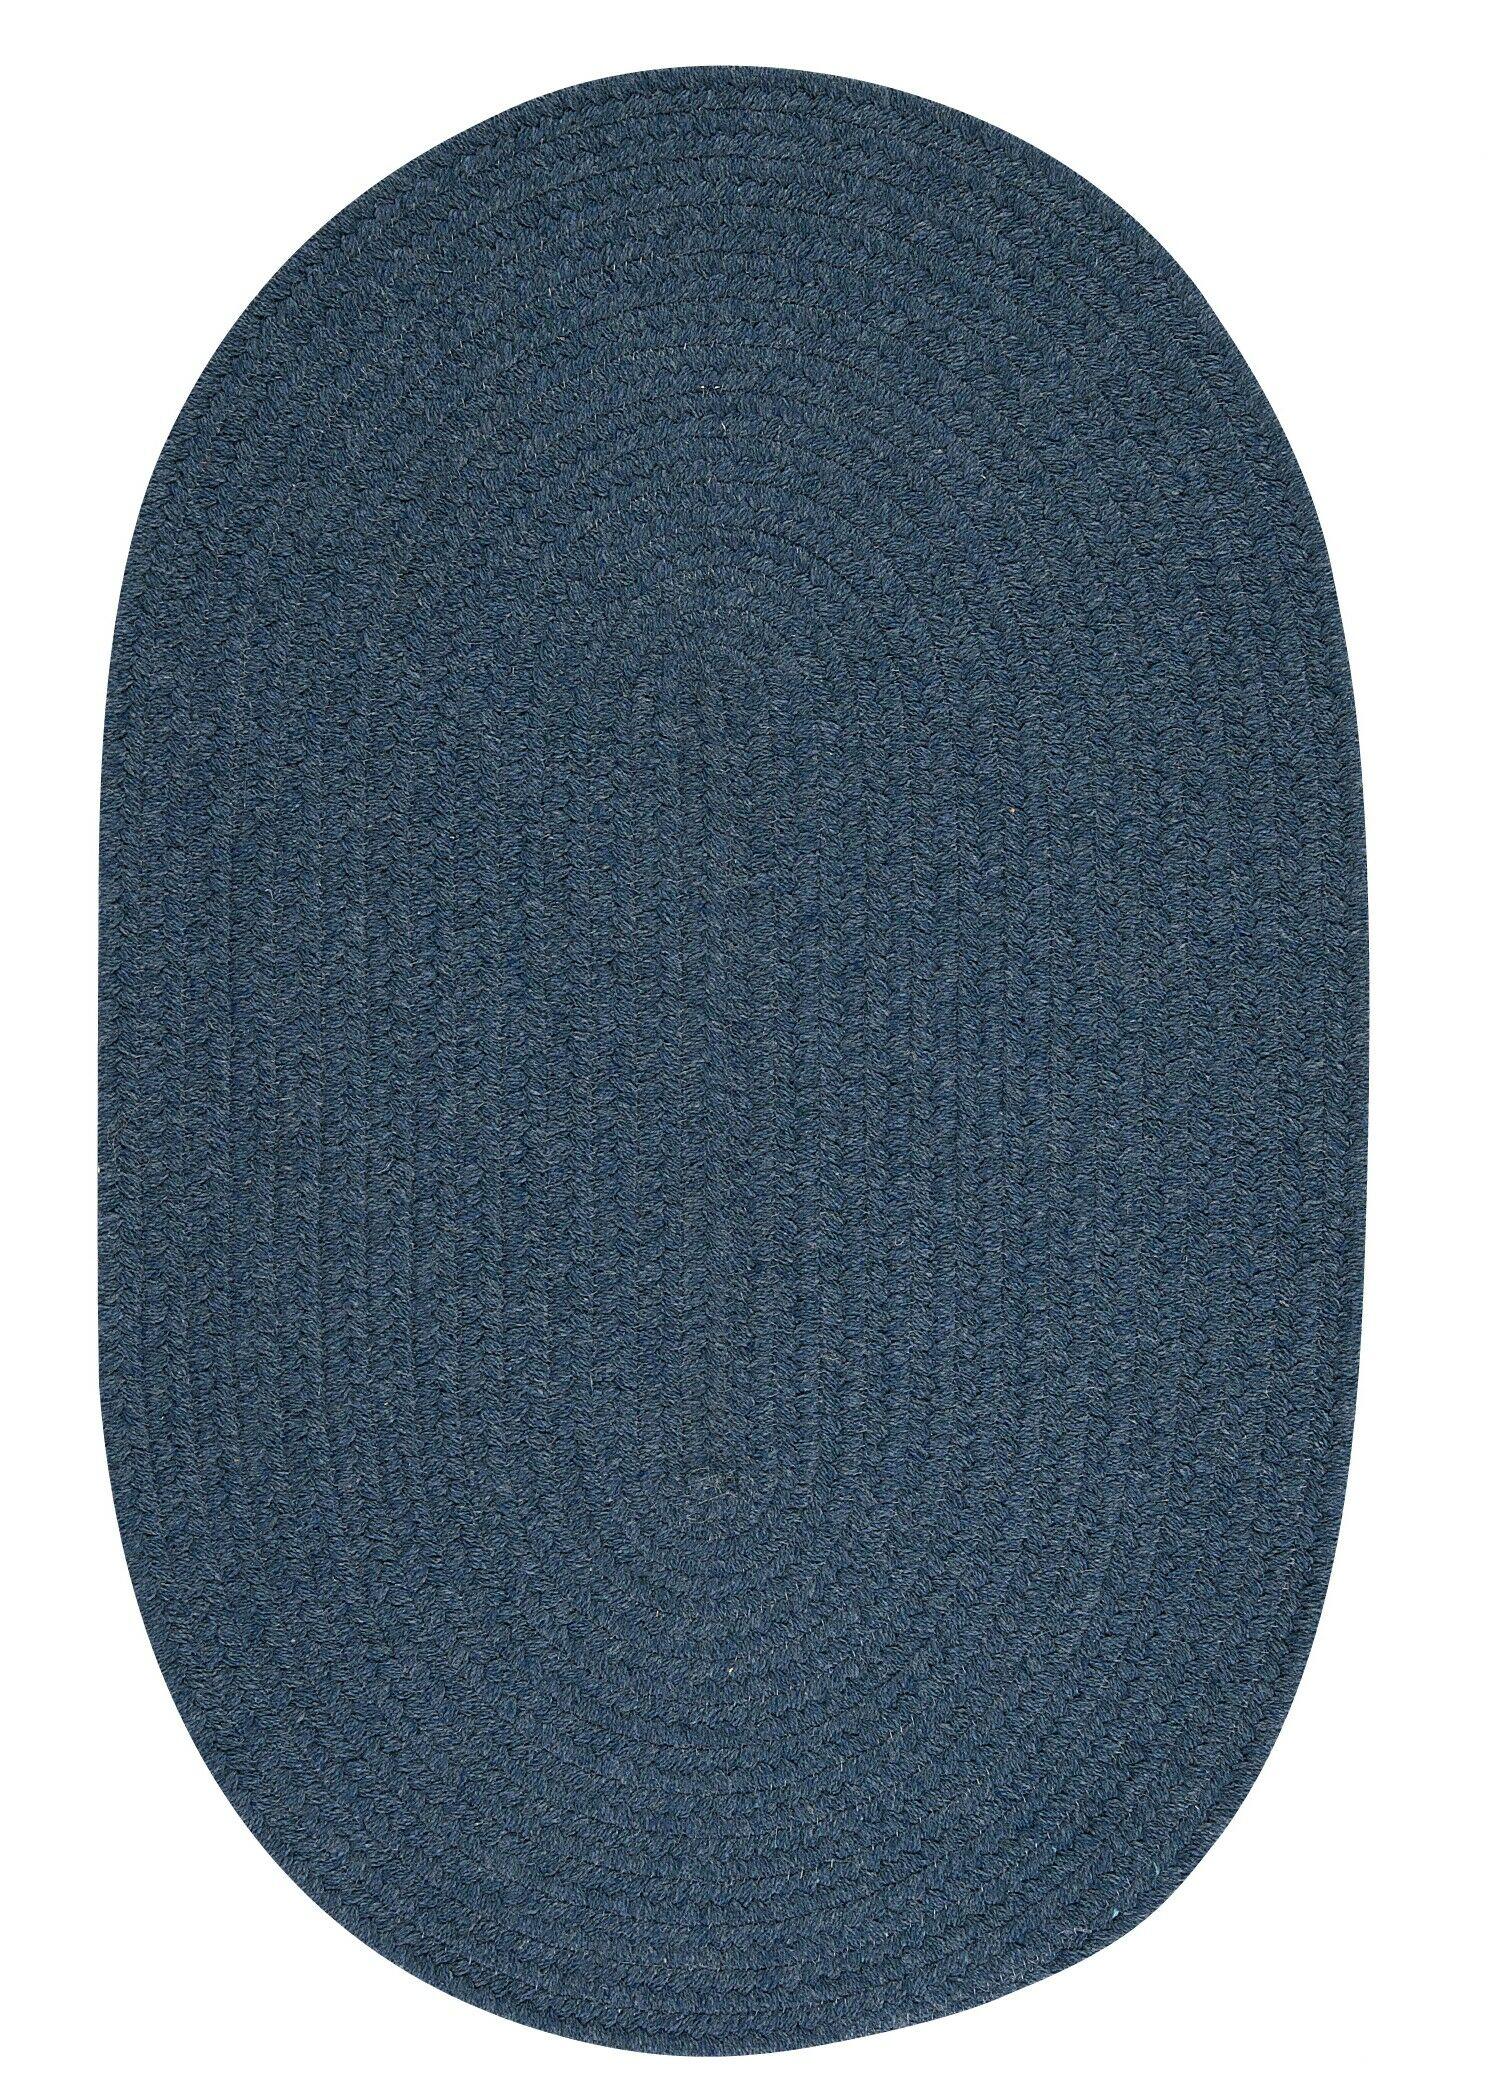 Navarrette Blue Area Rug Rug Size: Oval 8' x 11'